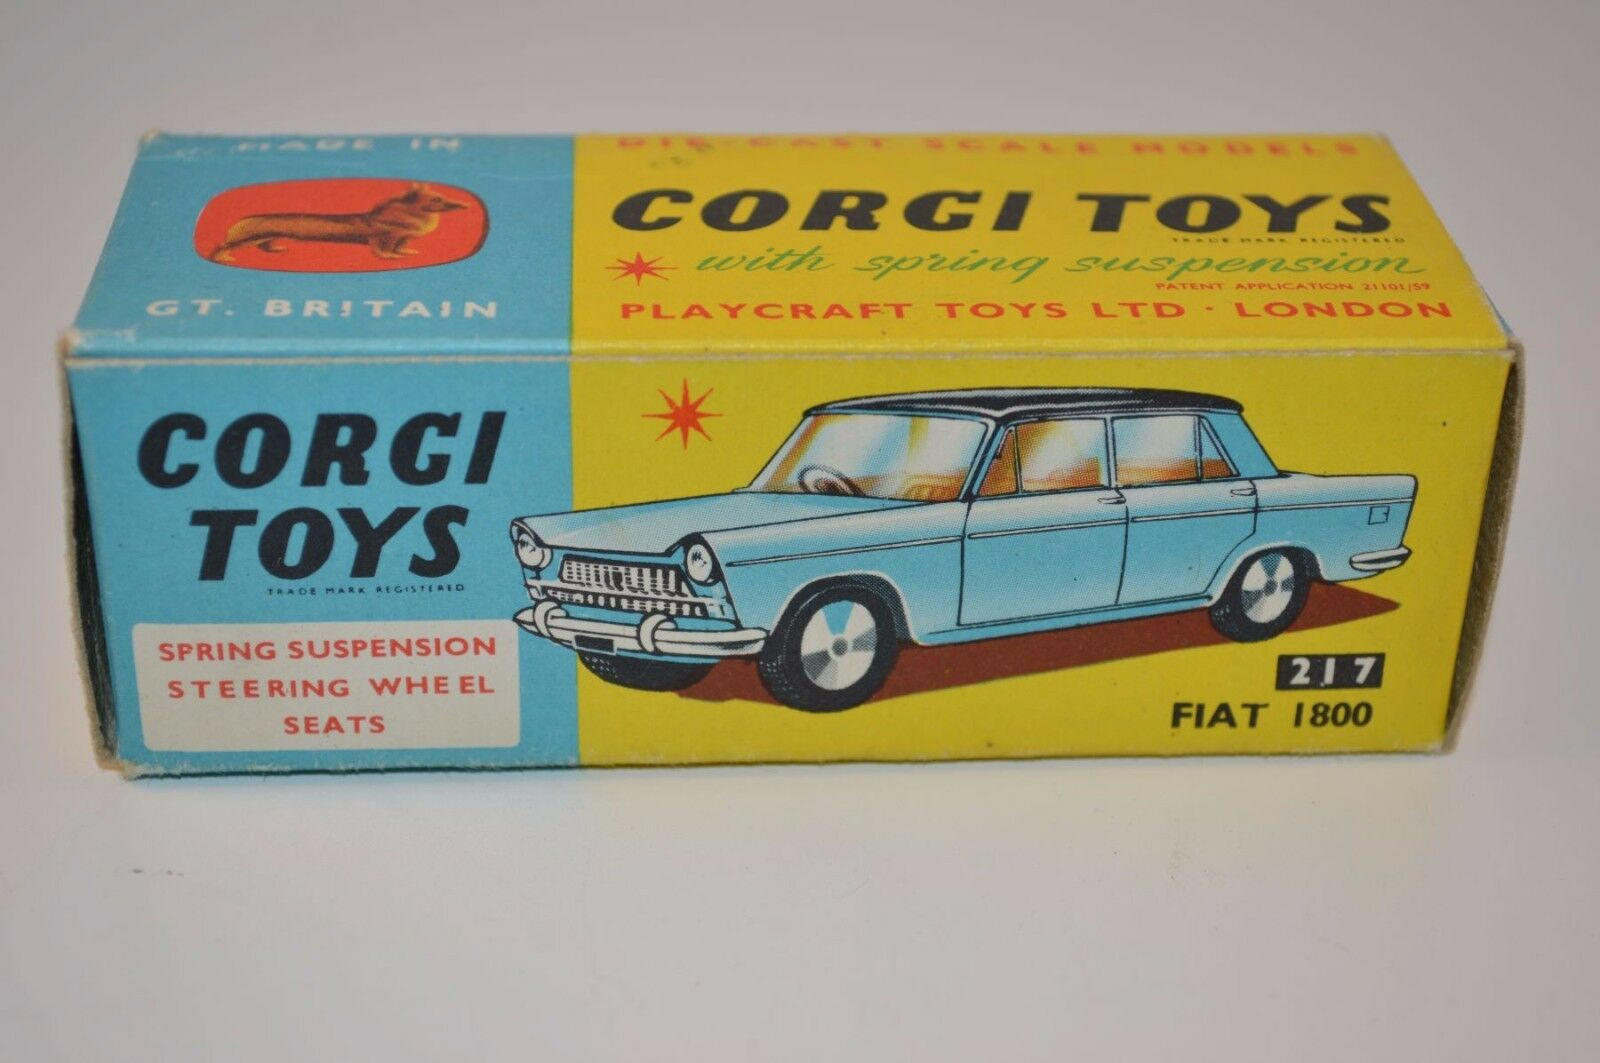 Corgi Toys 217 Fiat 1800 empty near mint complete original box